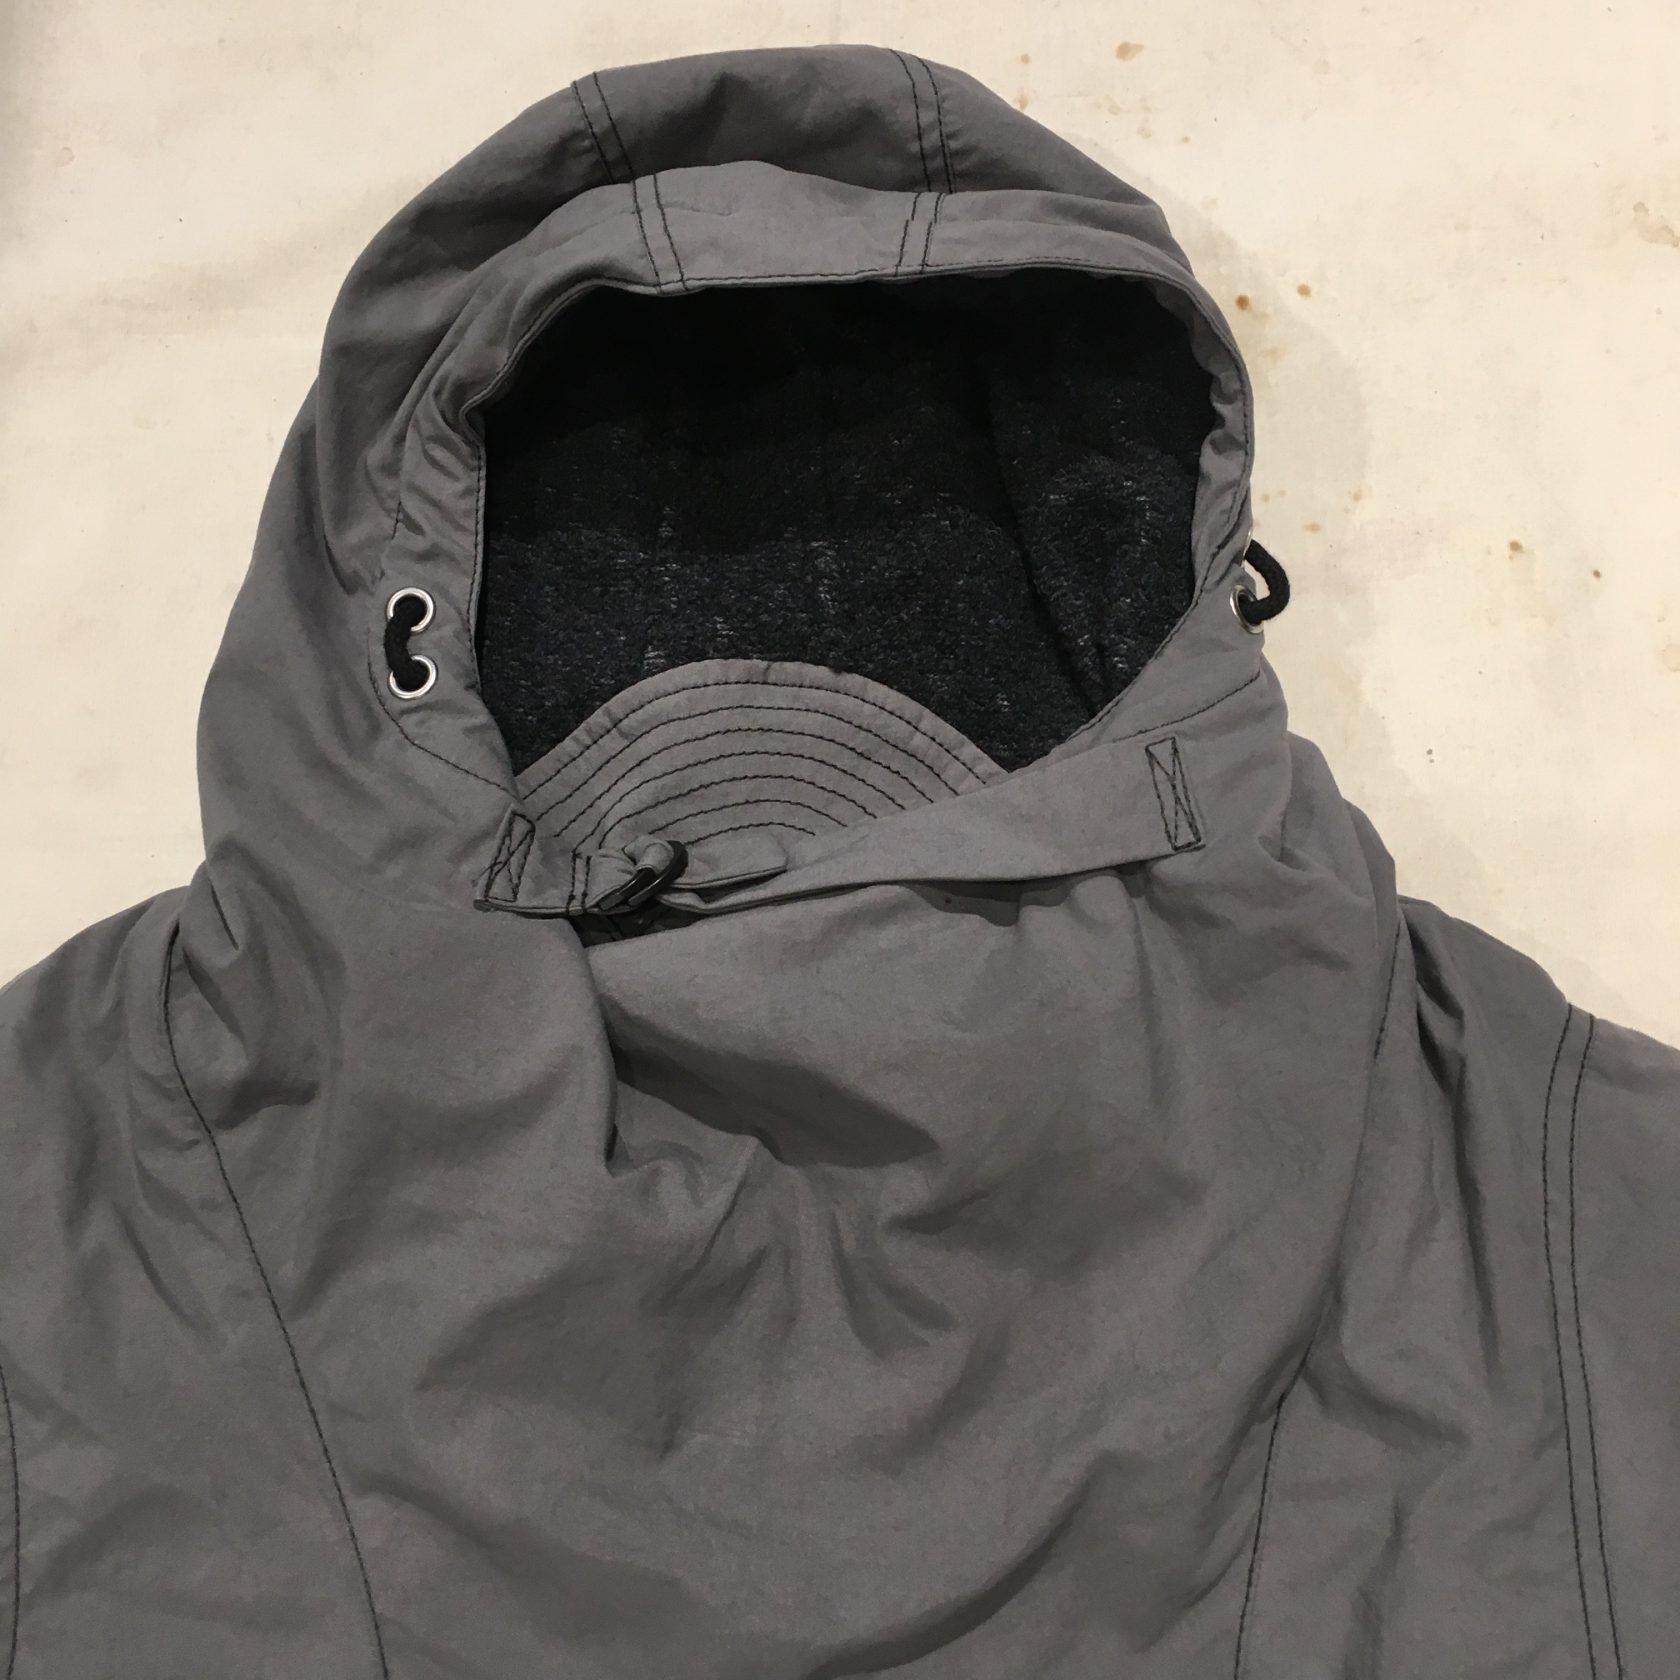 Hansen AW17 Roald Anorak ash gray and black